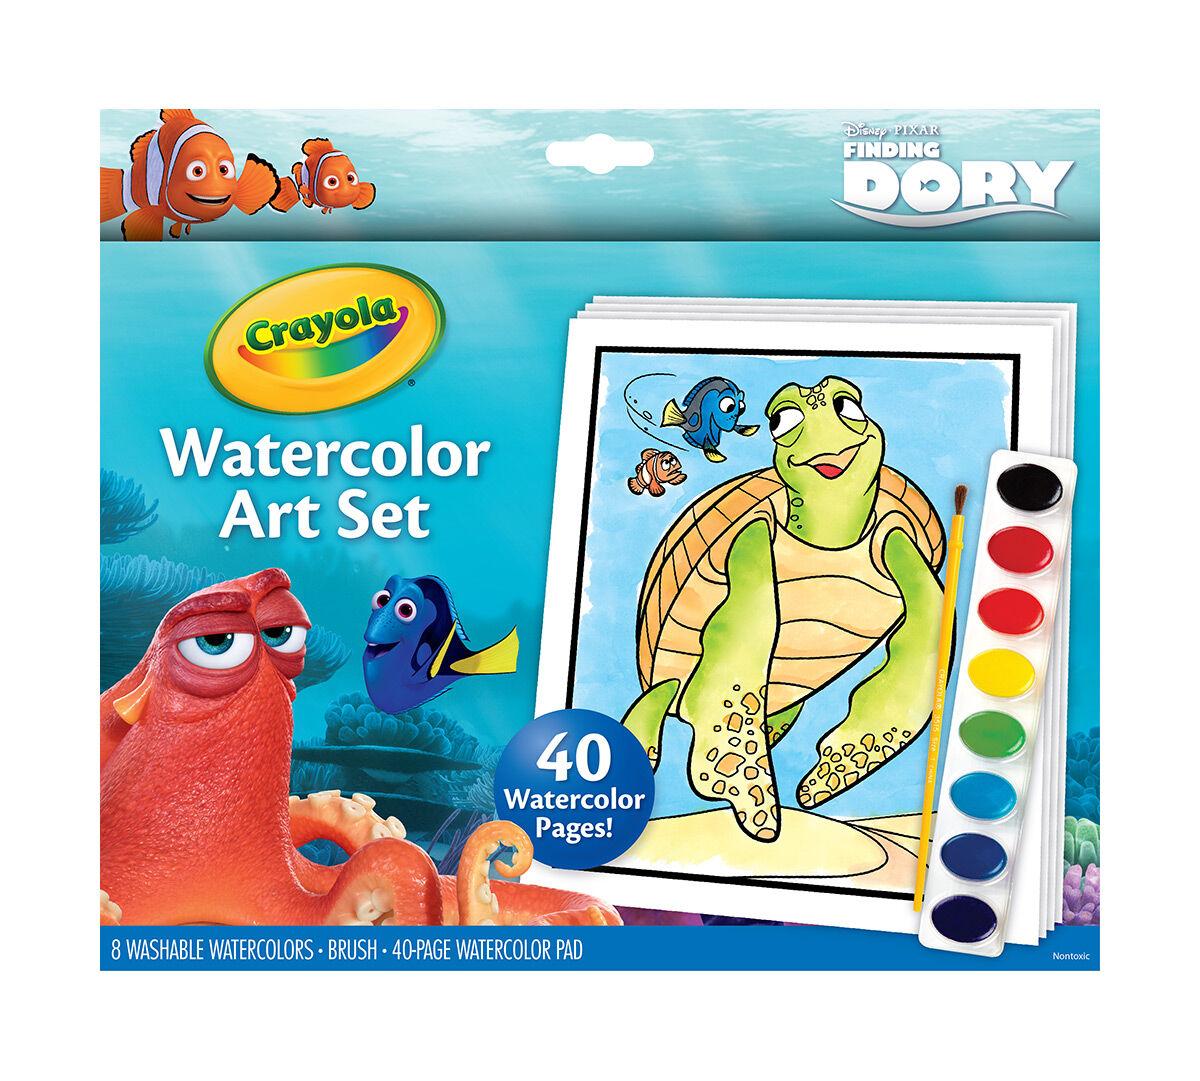 Watercolor Set, Finding Dory - Crayola